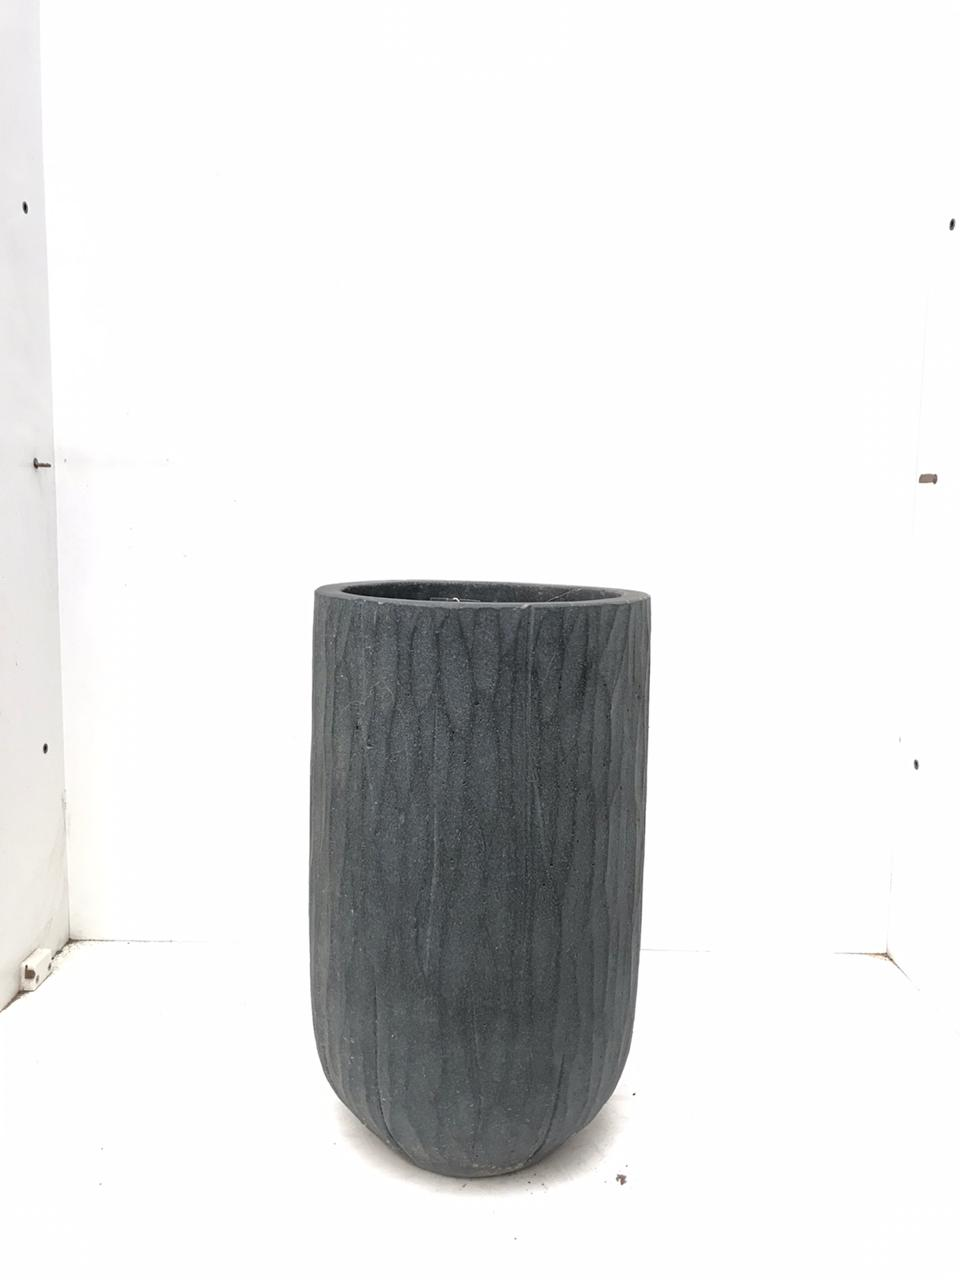 Vase Sep Black Small 'Pots & Vases'